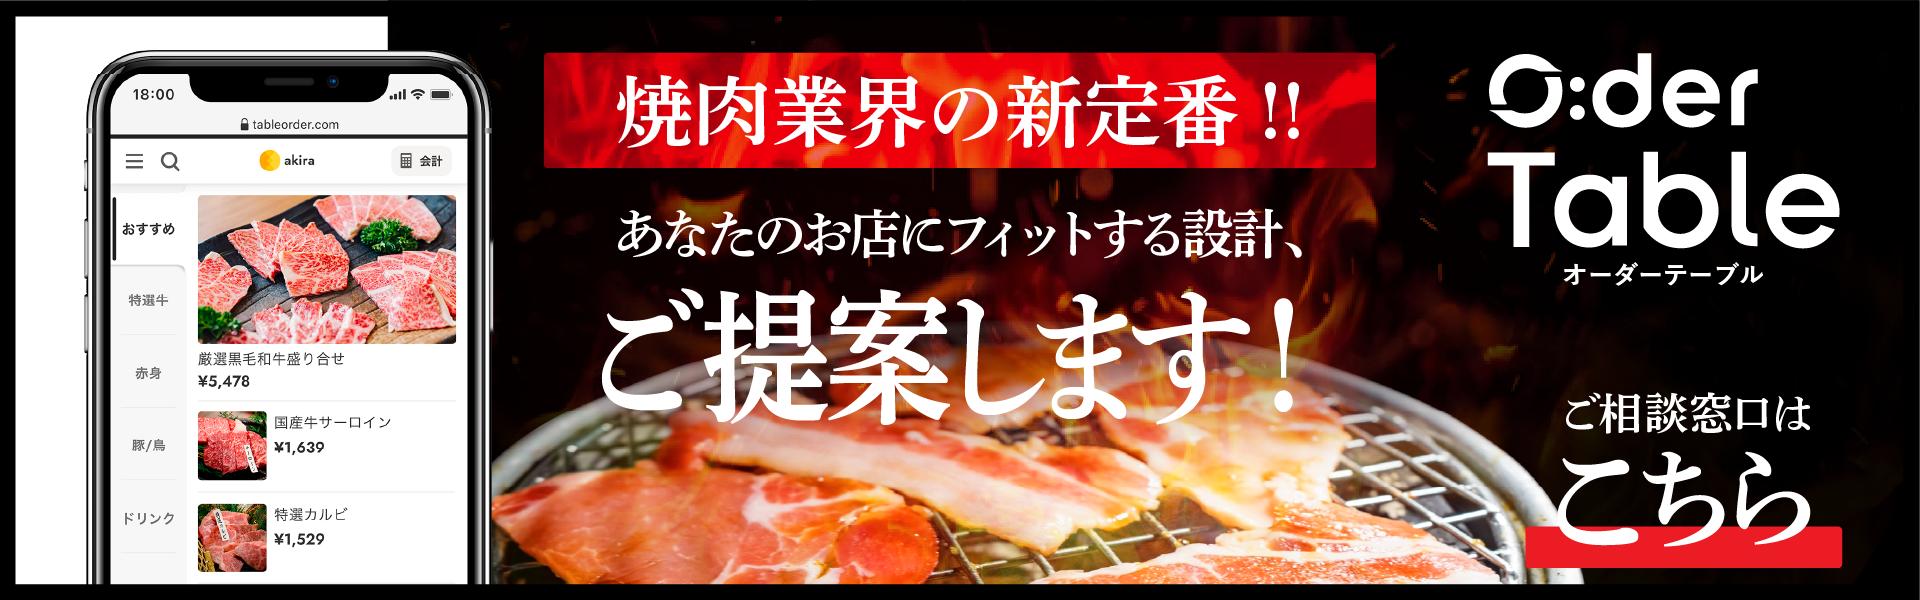 O:der Table_yakiniku contact Link